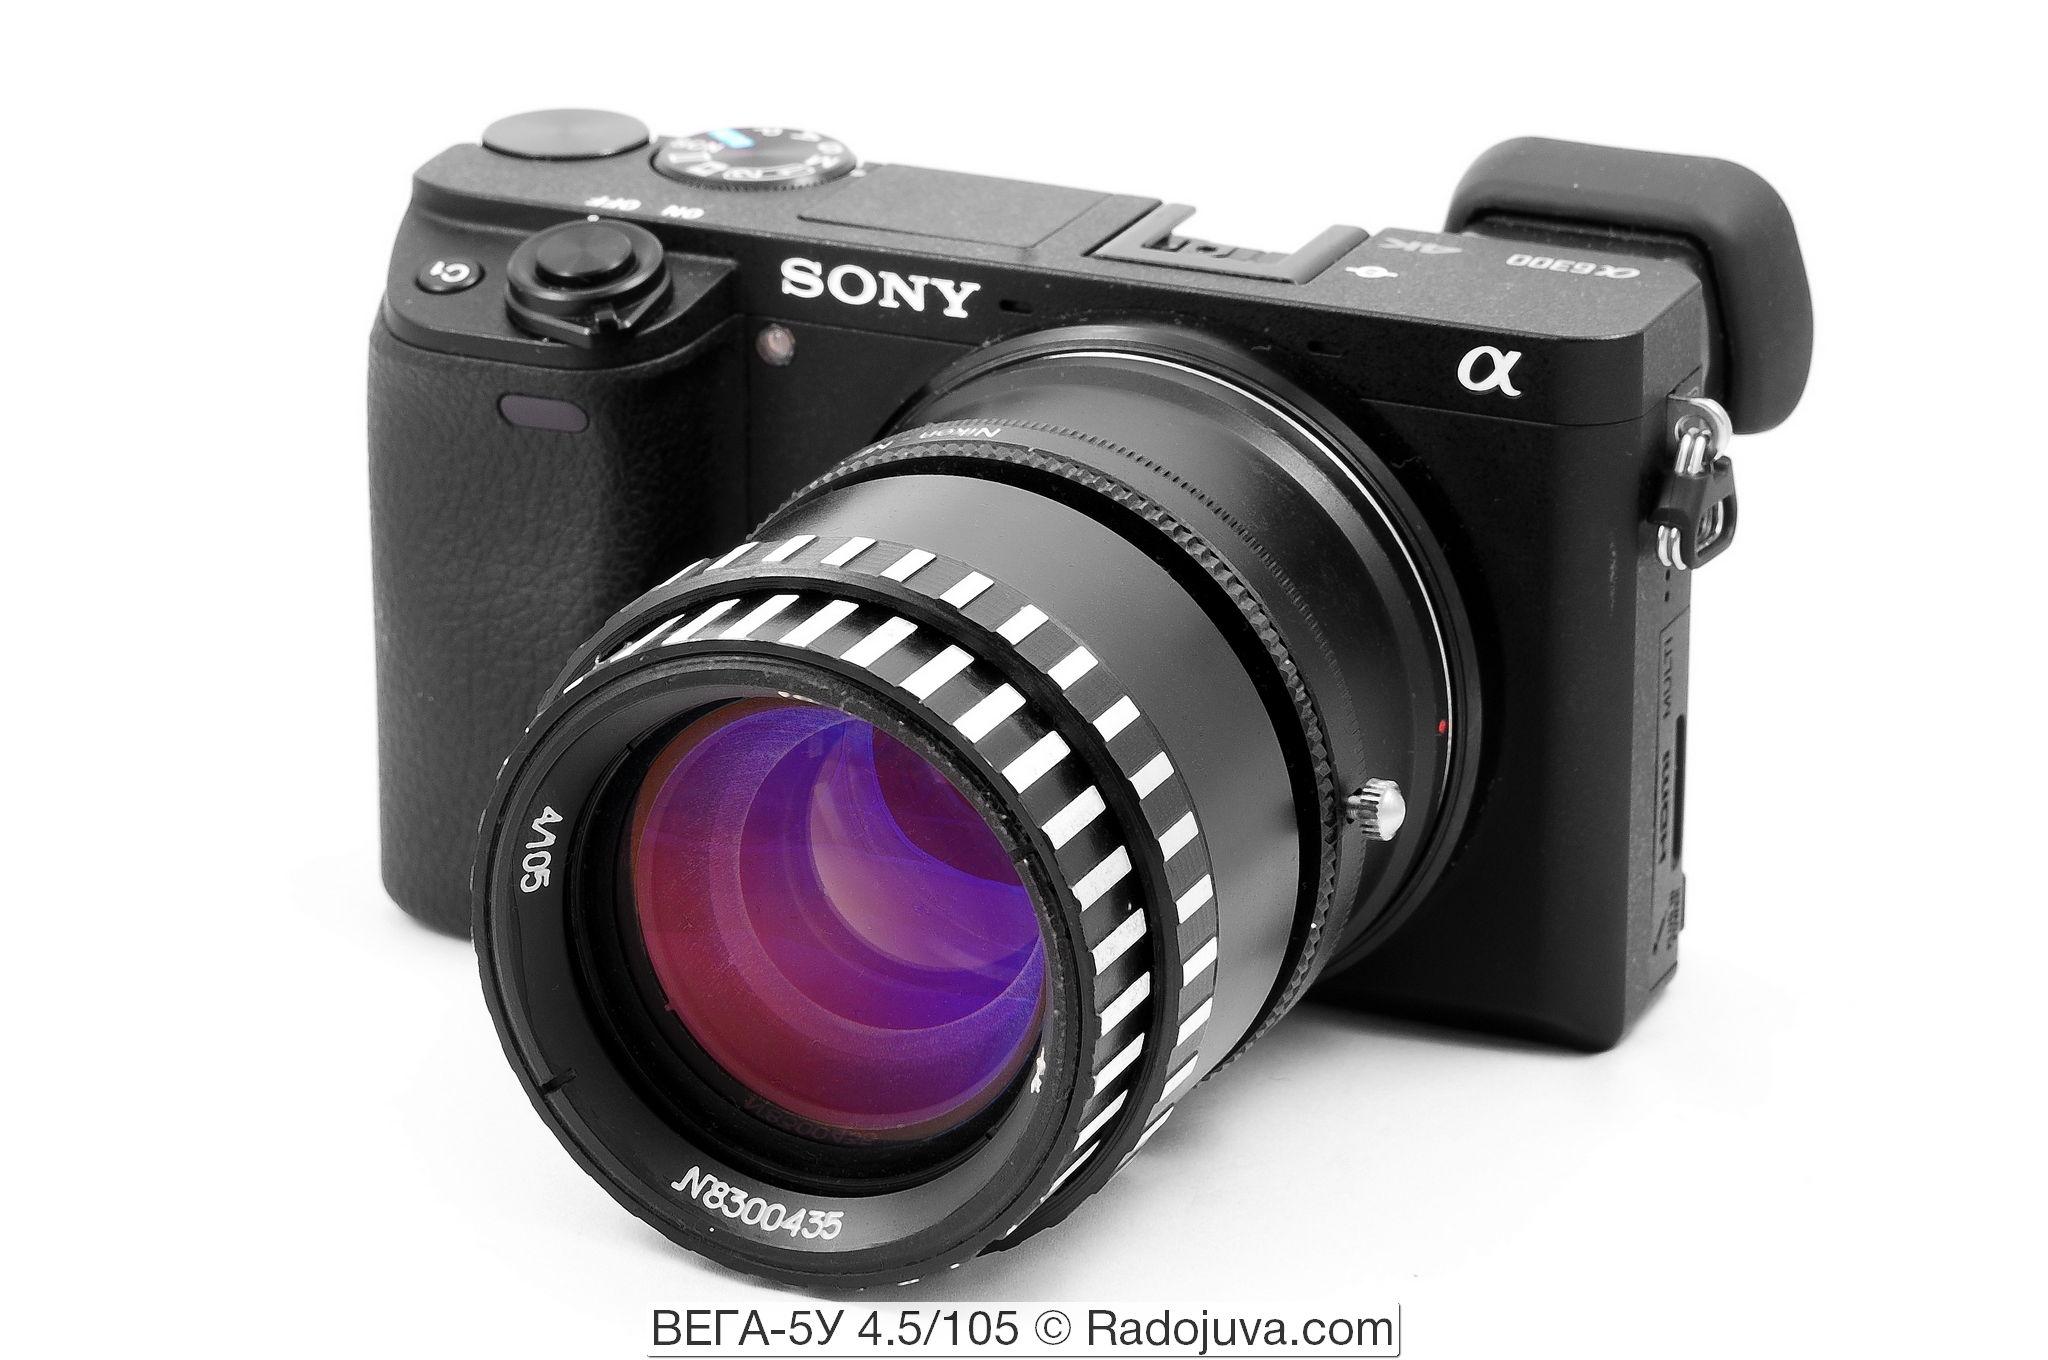 Вега-5У 4/105. Объектив показан на беззеркальной камере Sony a6300 (ILCE-6300).